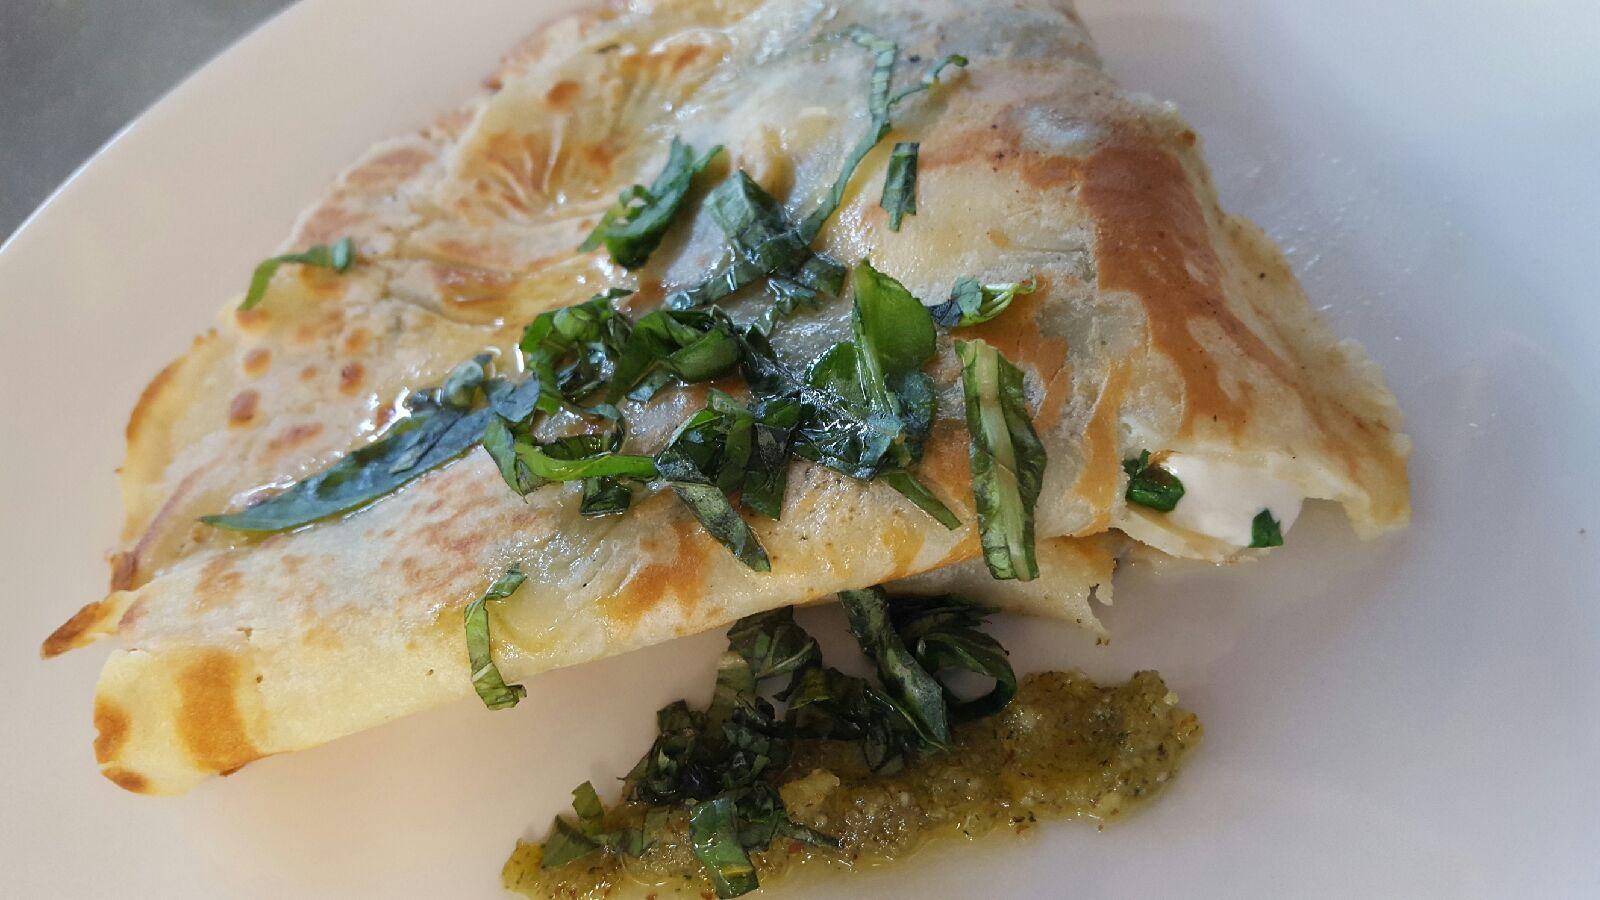 Caprese savory crepe - melted fresh mozzarella, fresh basil, tomatoes and house made pesto.jpg